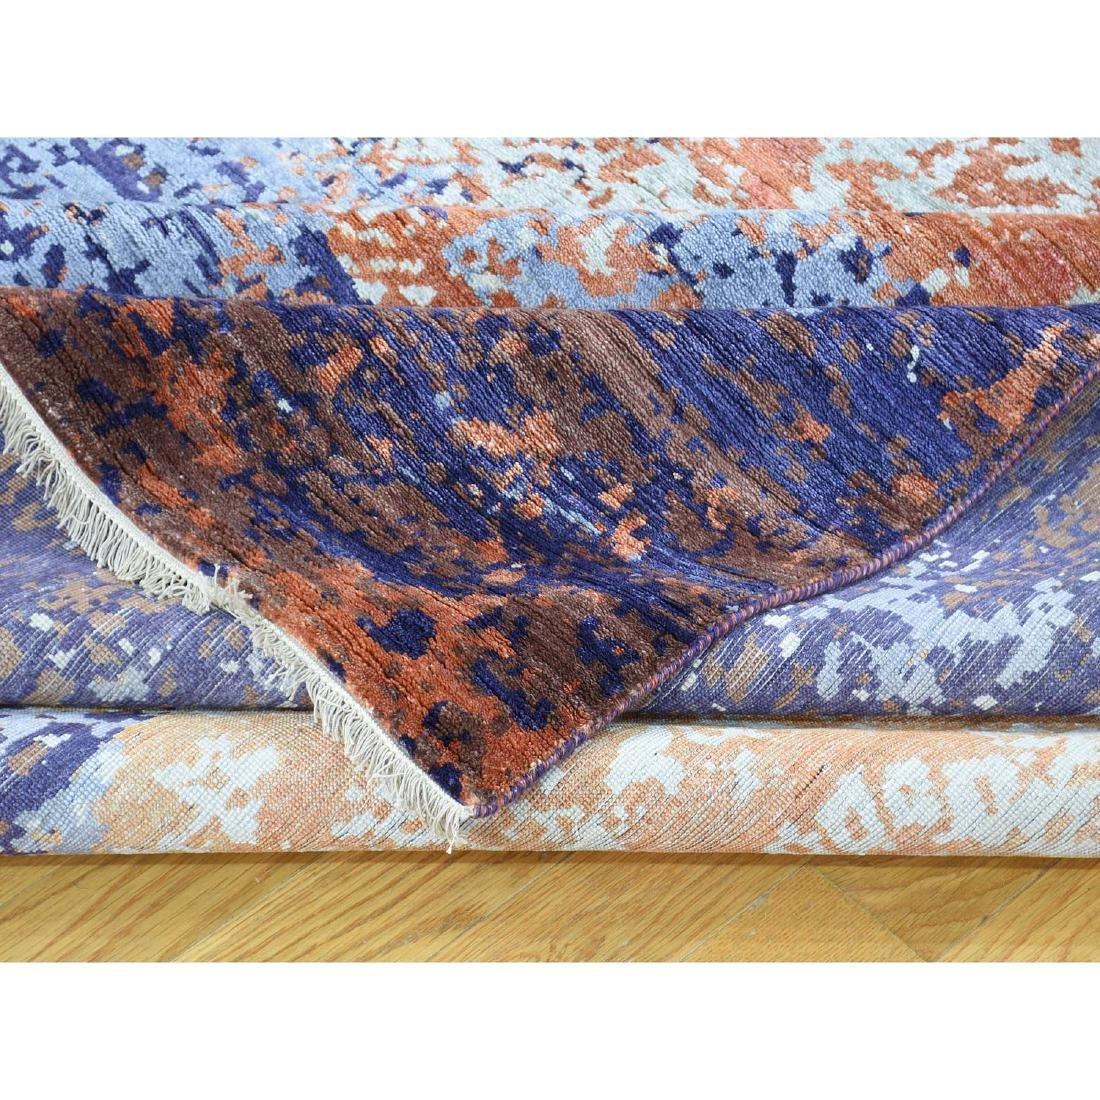 Wool and Silk Modern Broken Design Hand-Knotted Rug - 8